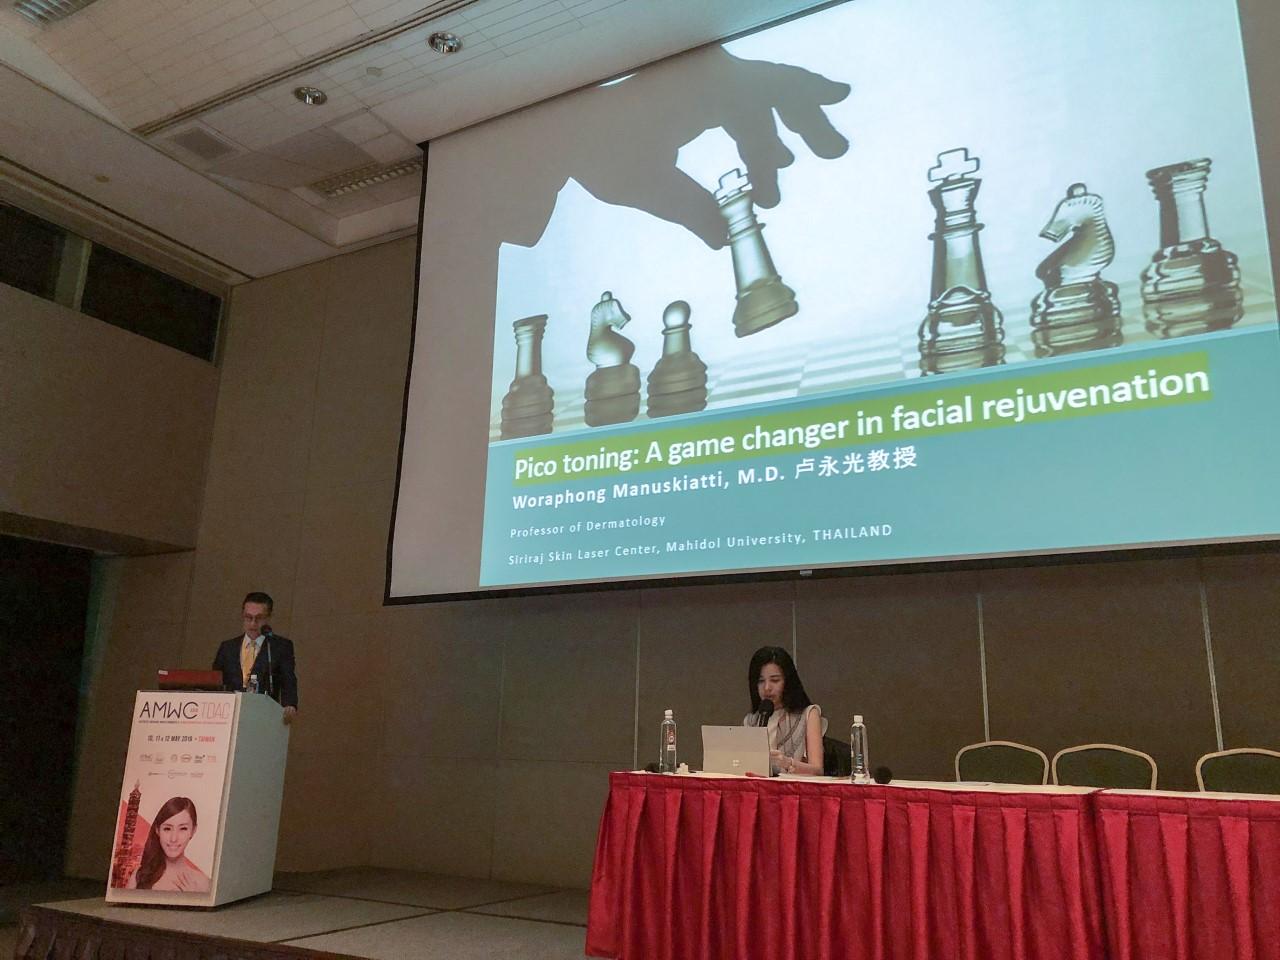 Siriraj Faculty Delivered 3 Presentations at